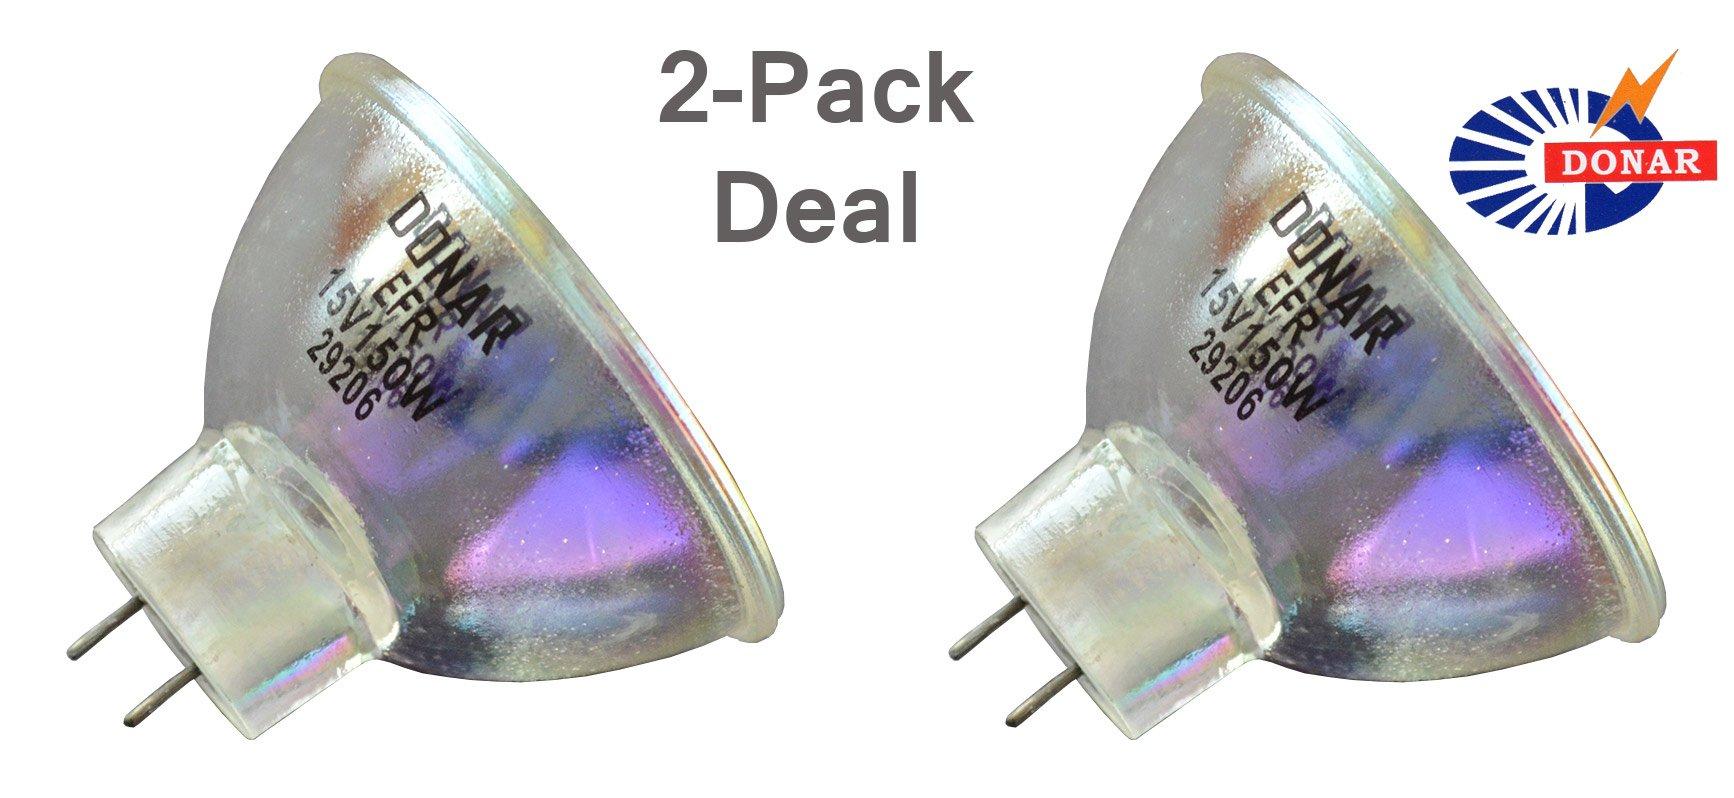 2pcs EFR 15V 150W RM-107 Donar Bulb for VIVADENT HELIOMAT H10 SINGLE & MULTI EURO 7101 7110 – Volpi 150H Universal, Intralux Dual 5000 150 150H TOPCON 300 320 600 OM-5 OMS-300 Medical Dental Lamp